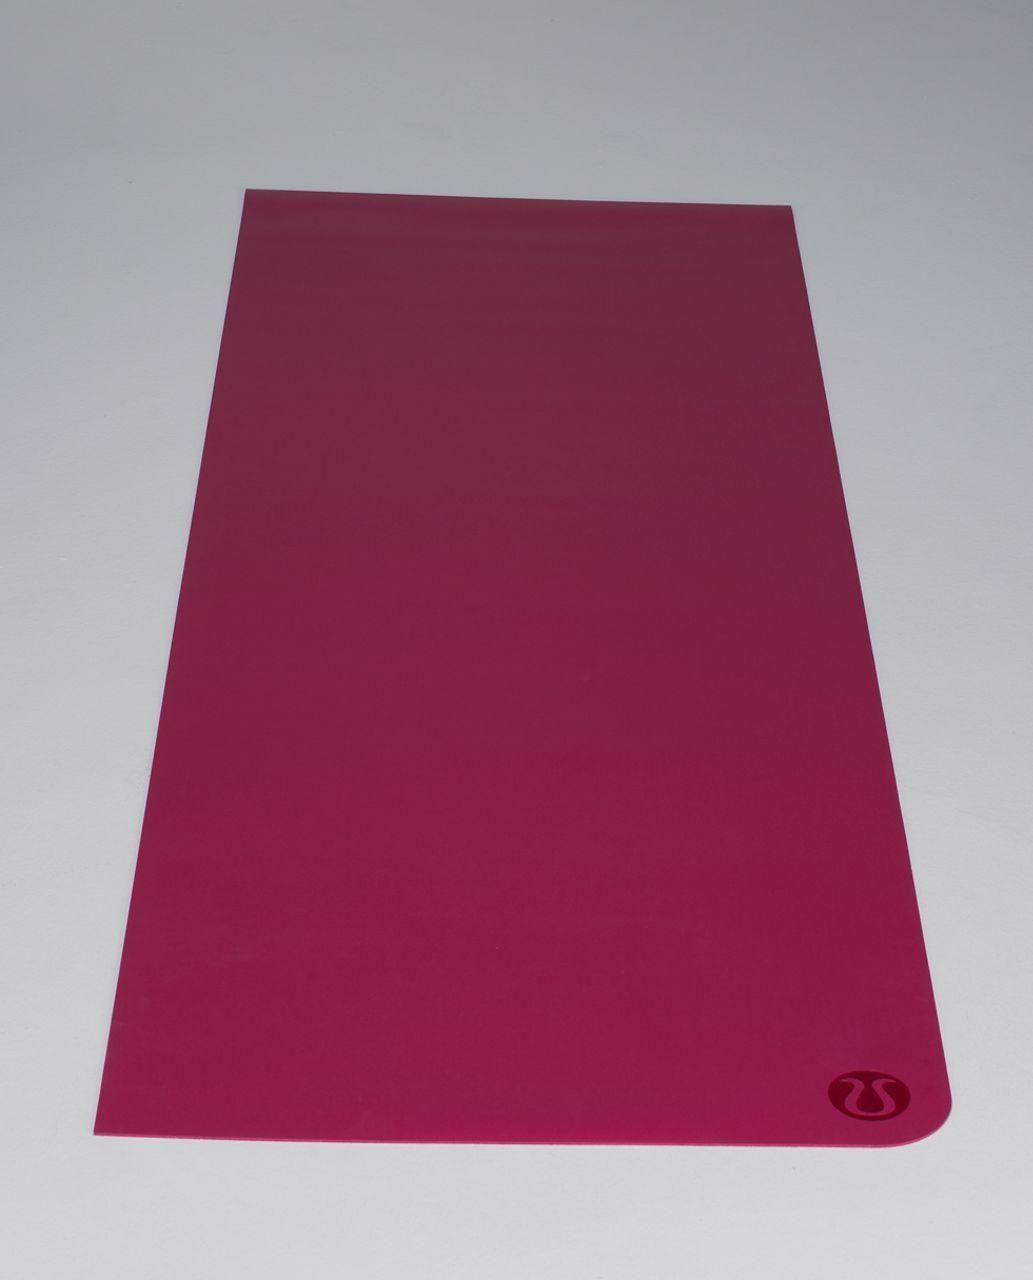 Lululemon The Mat 3mm - Bumble Berry / Boom Juice